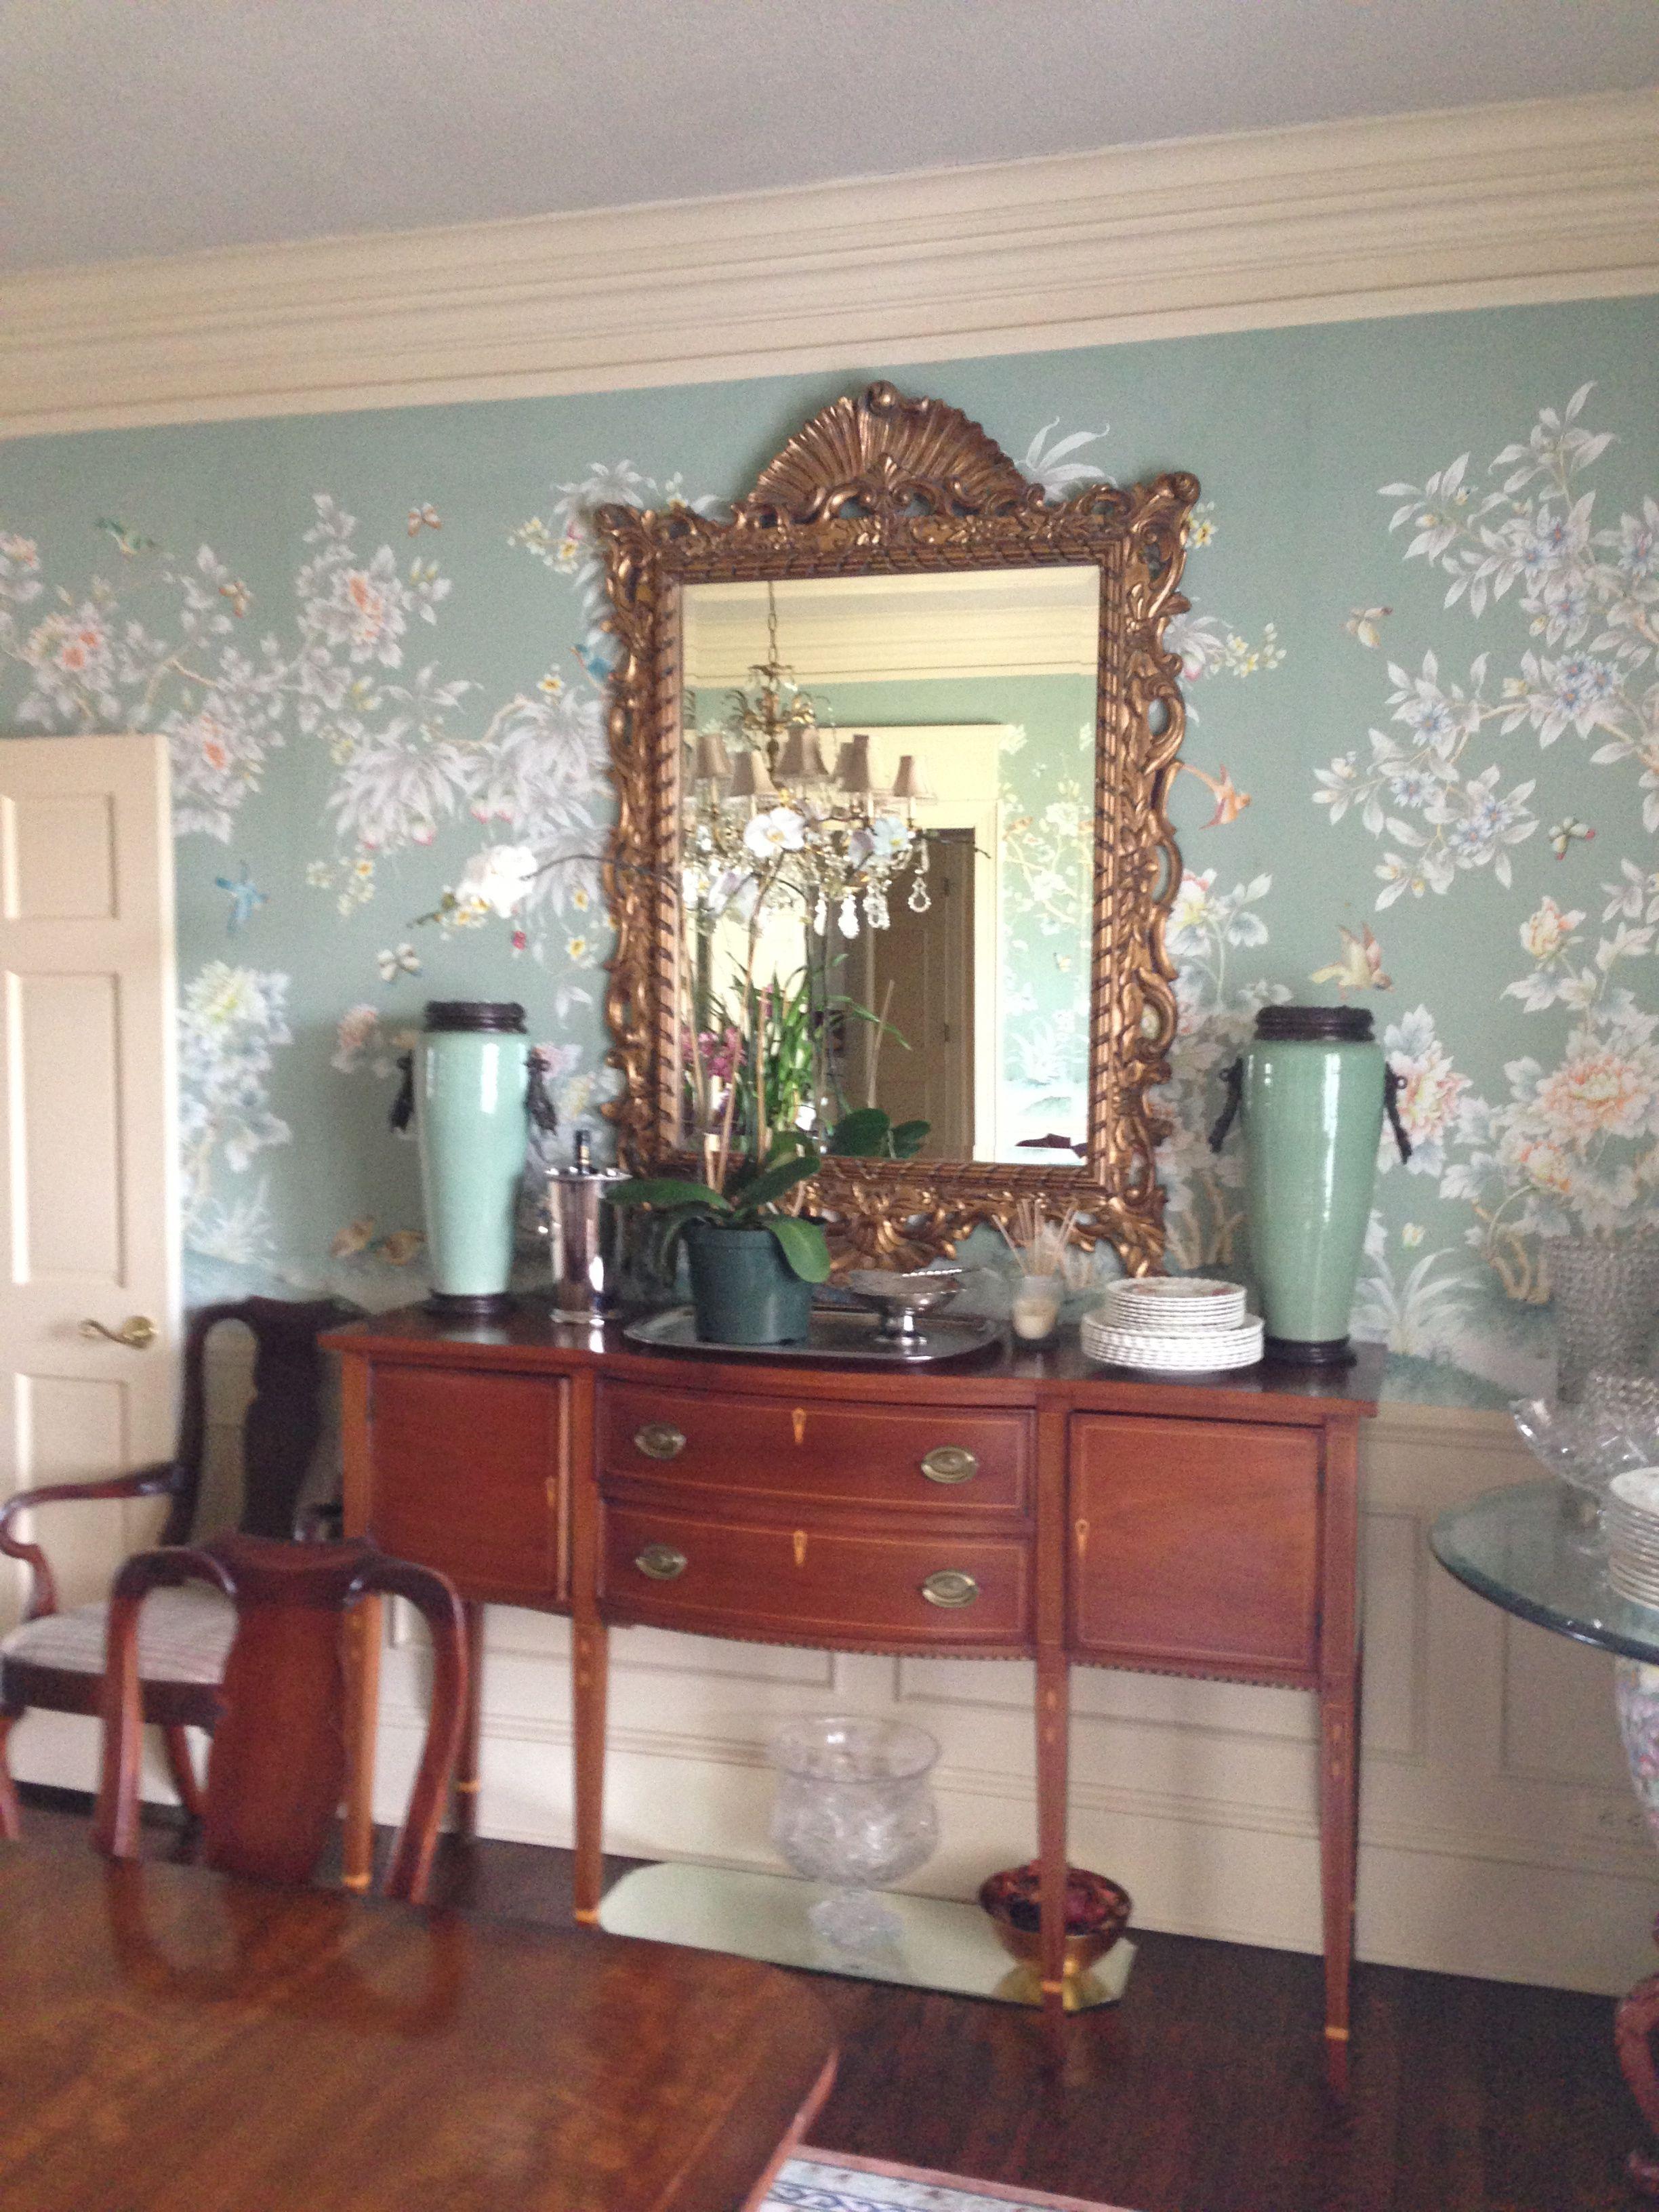 buffet table with mirror above   Buffet decor, Home decor, Decor